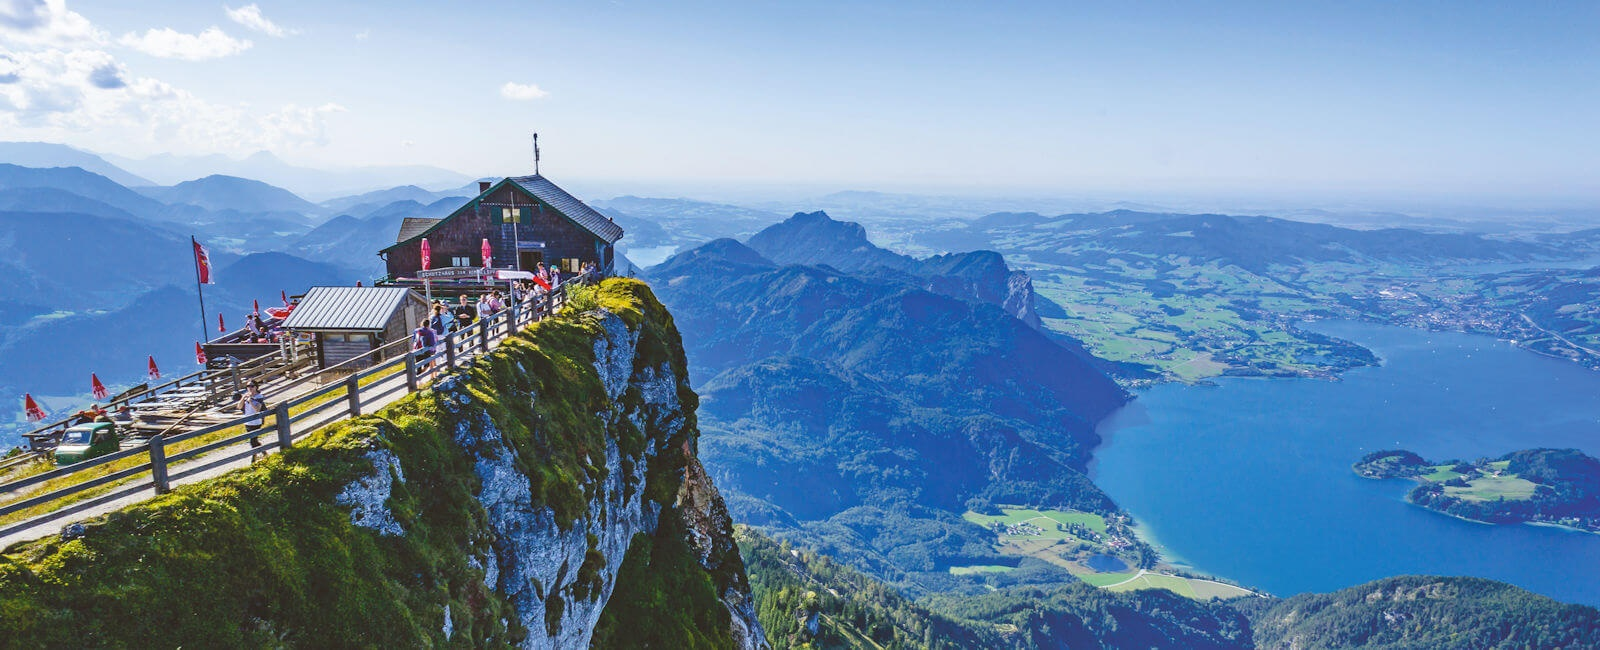 luxury austria holidays